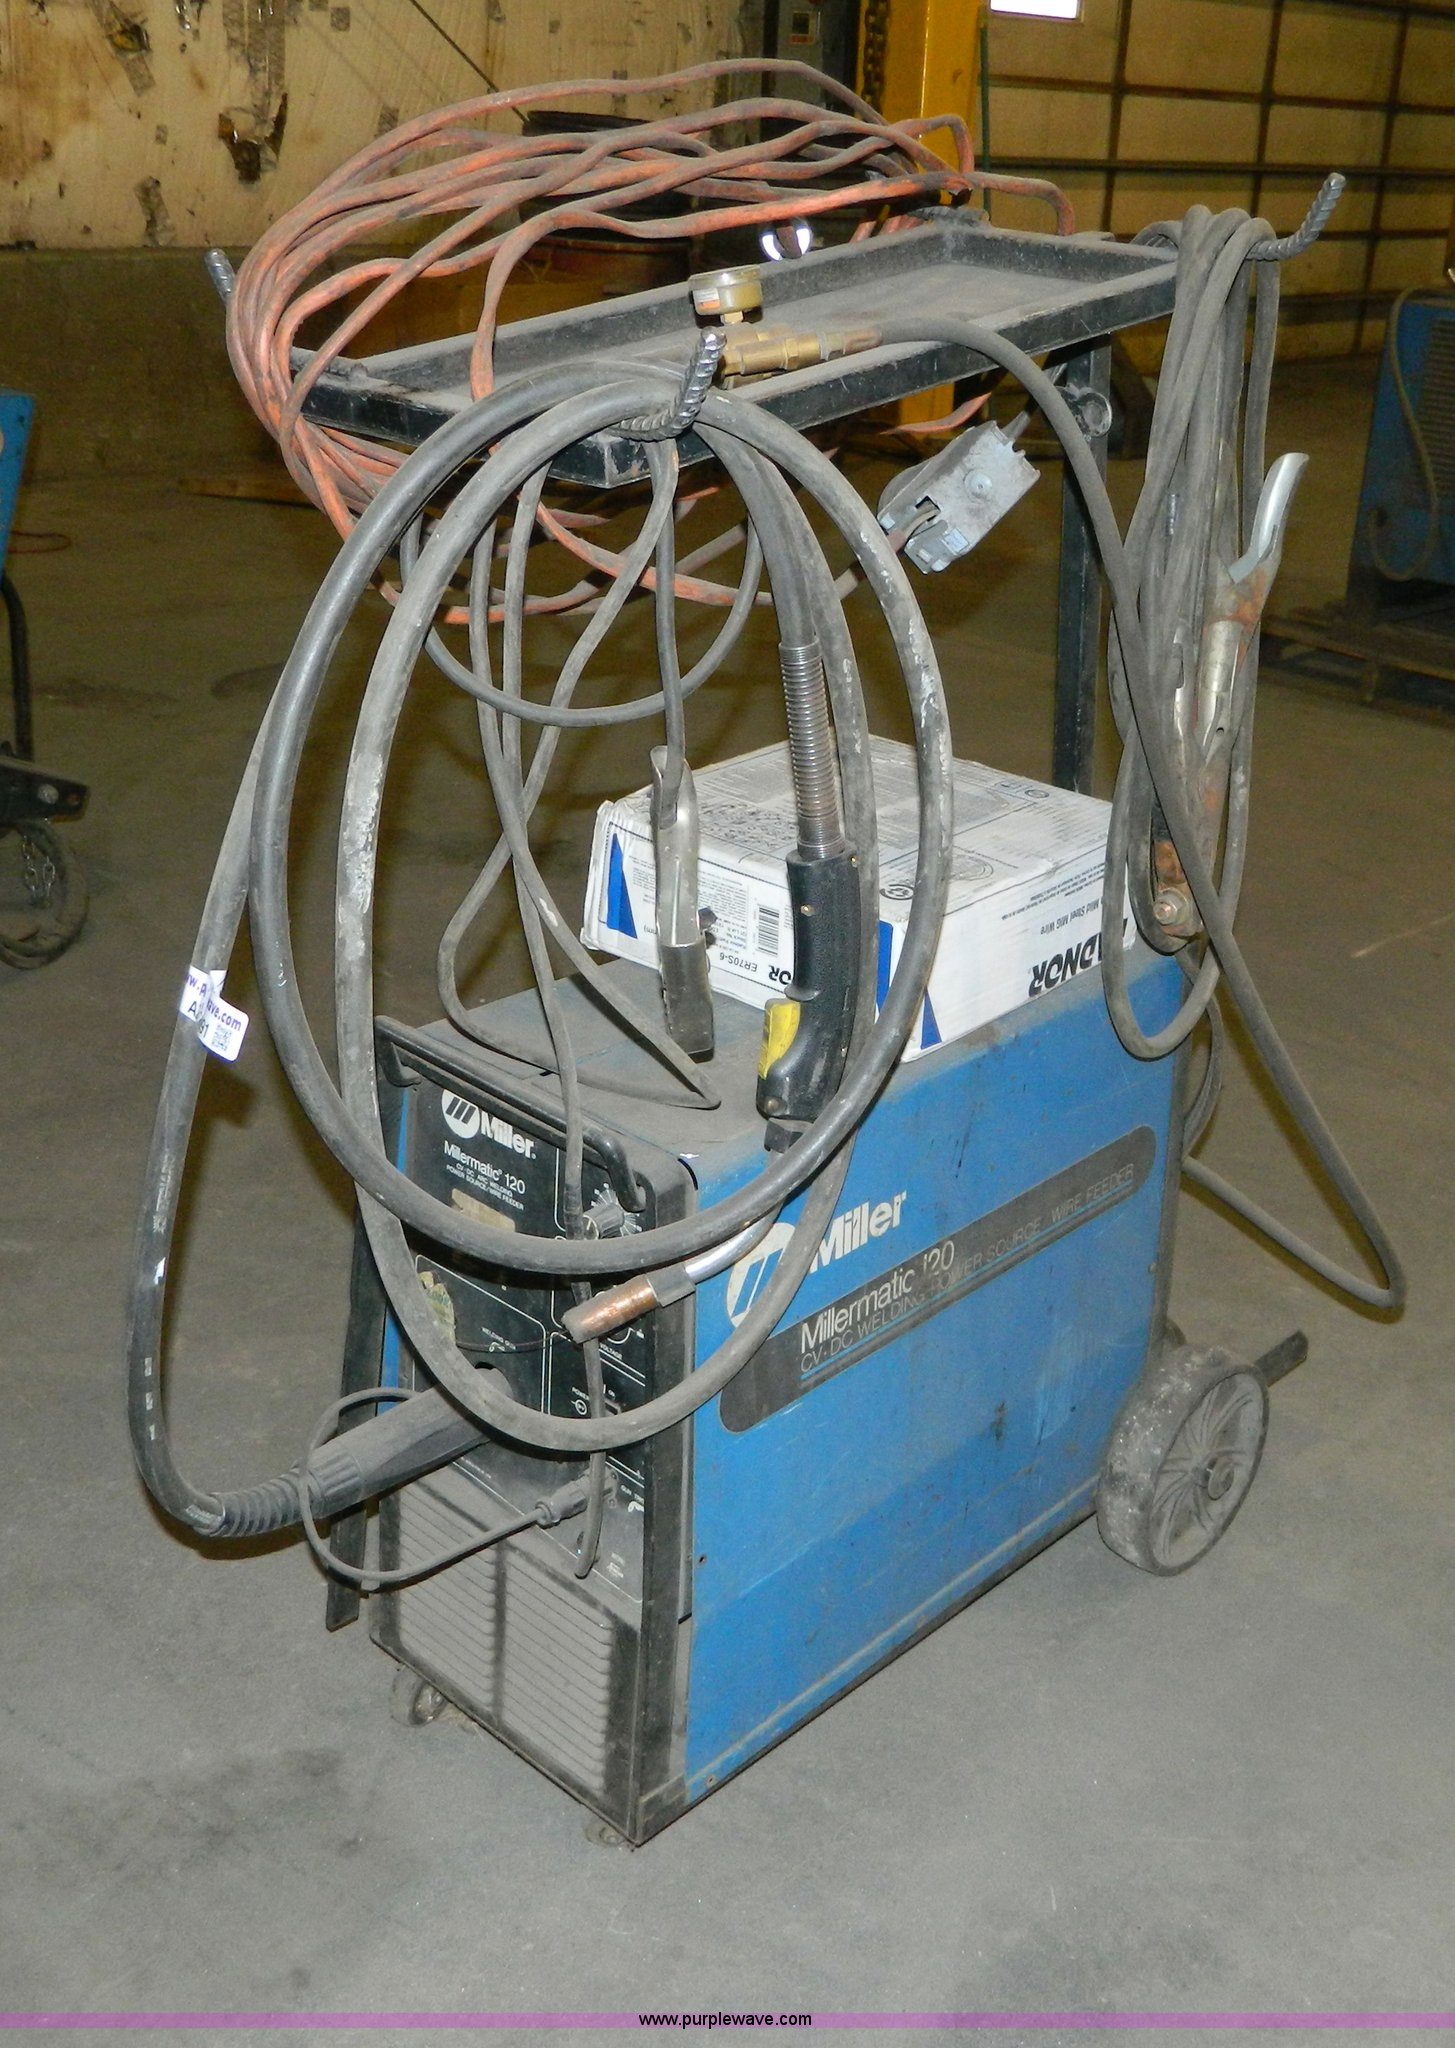 Miller Millermatic 120 CV/DC welder | Item AZ9091 | SOLD! No...